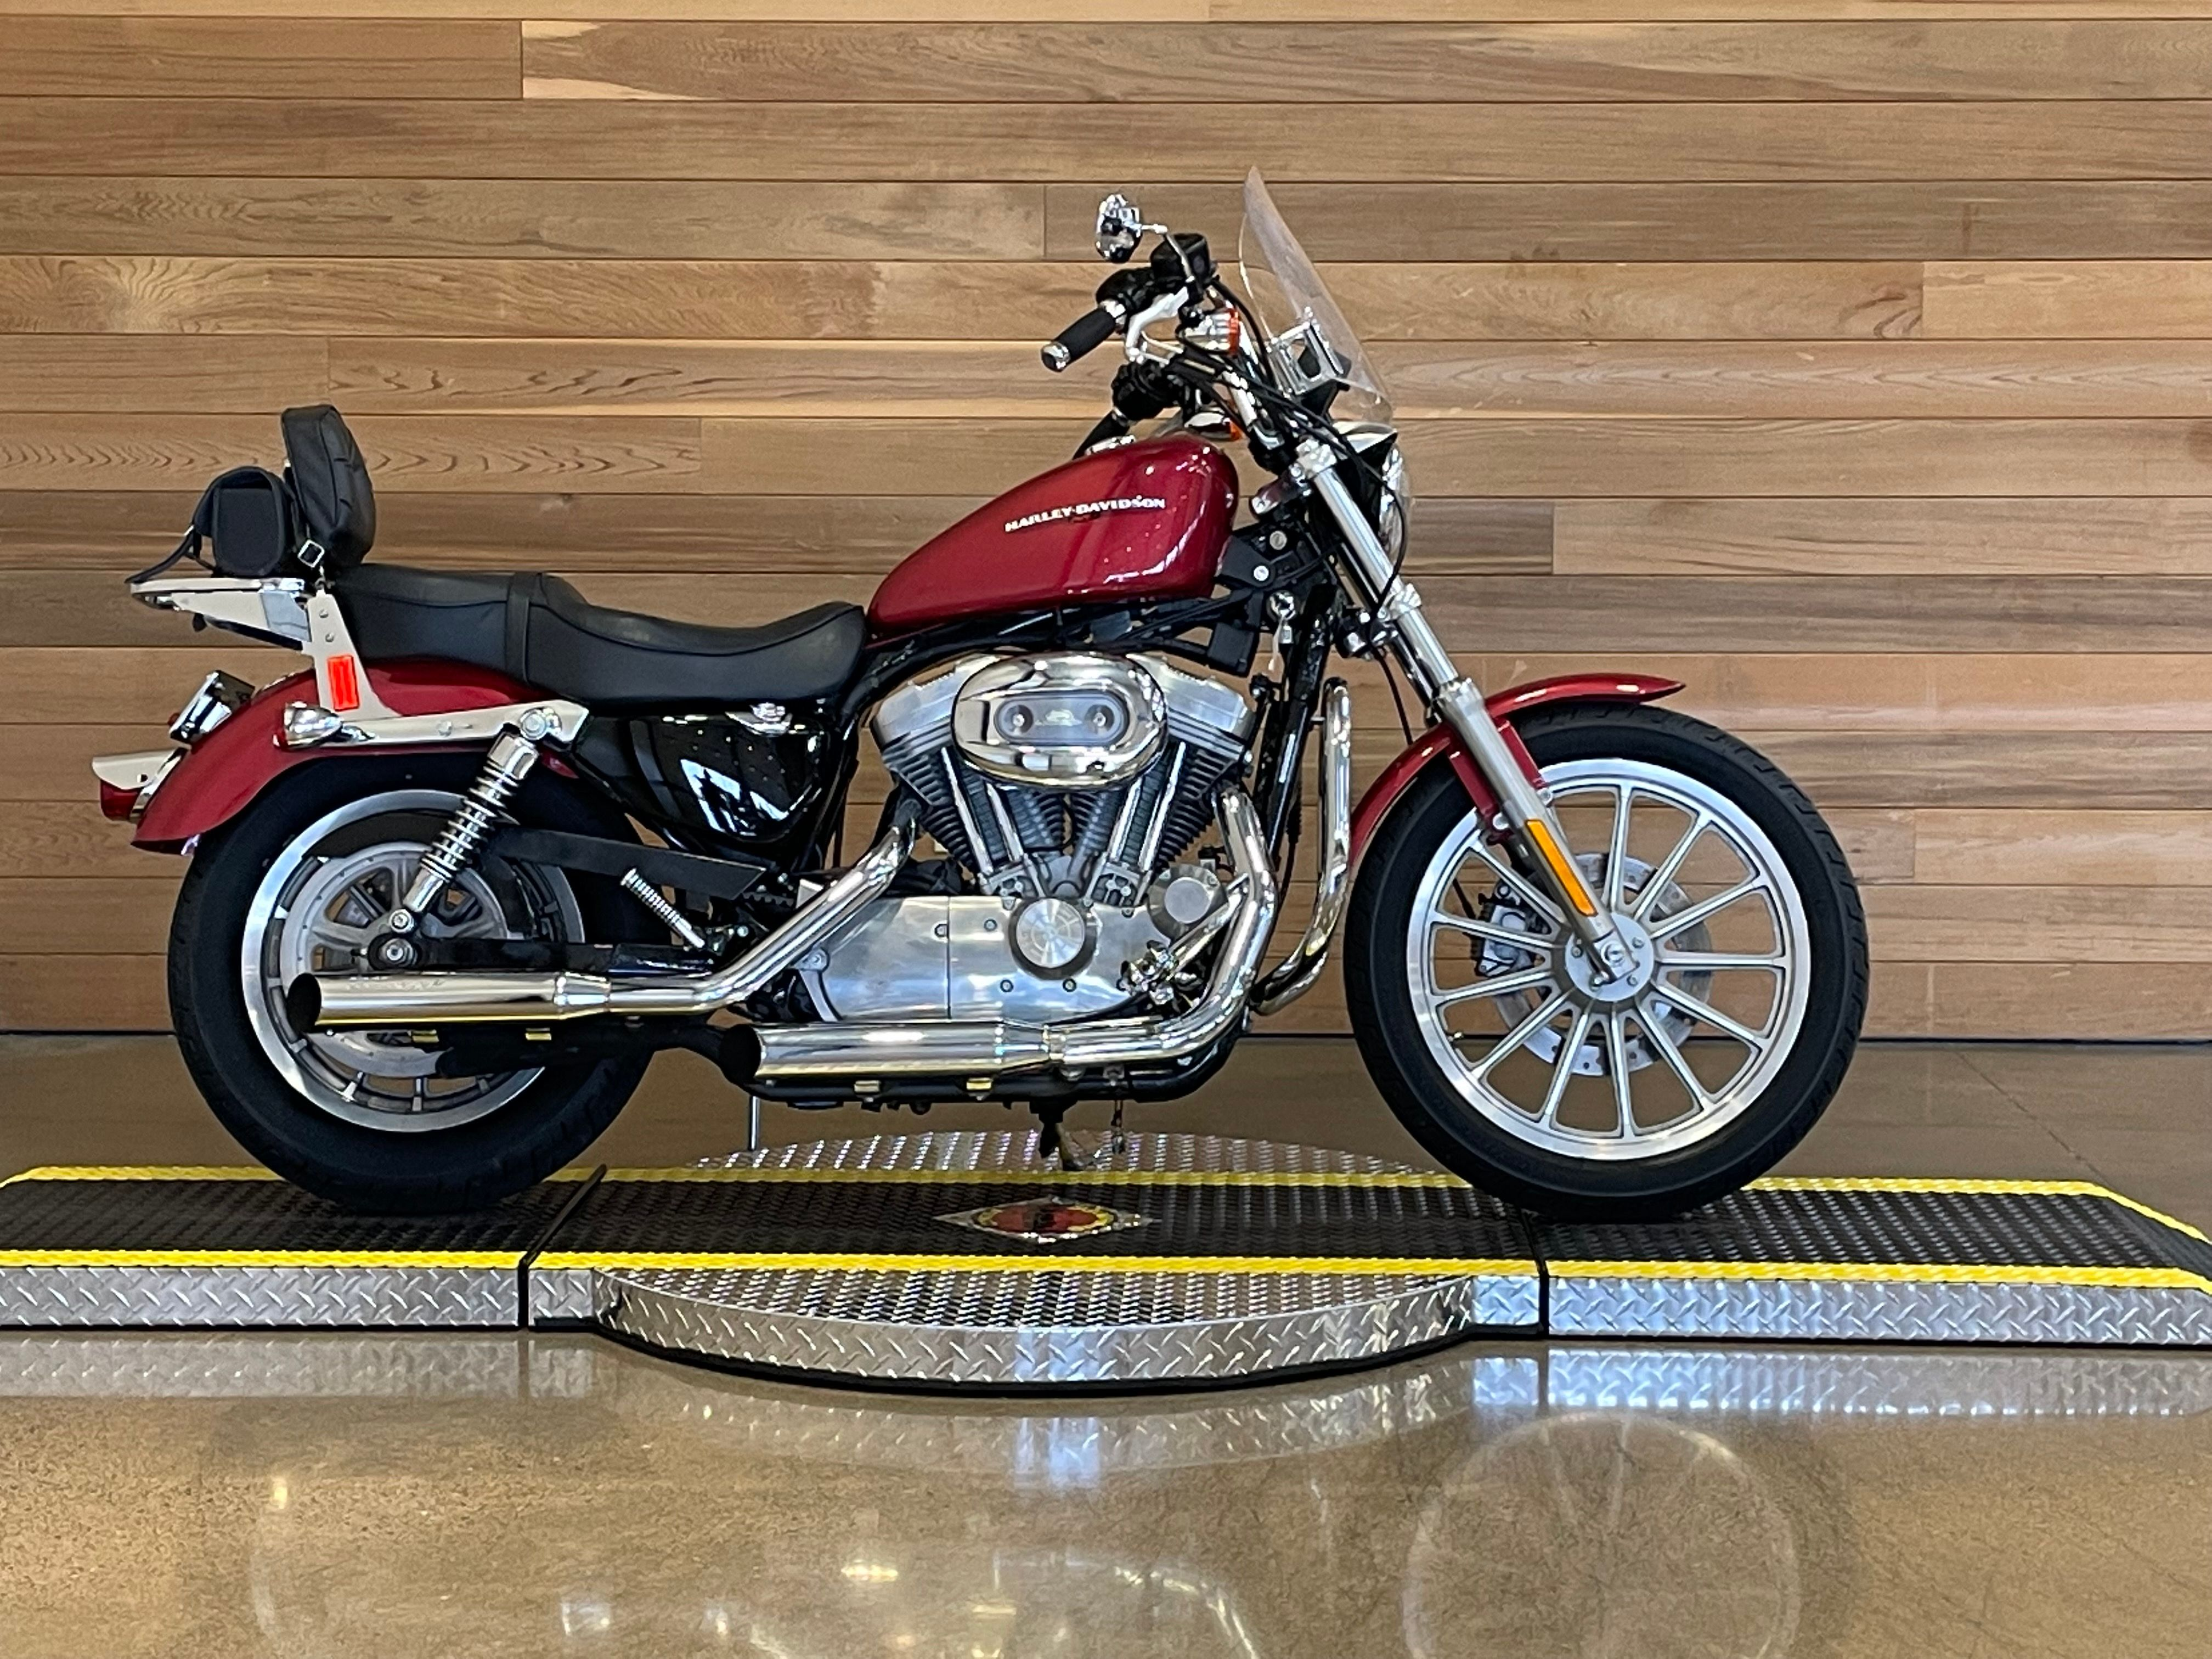 2005 Harley-Davidson 883 Low